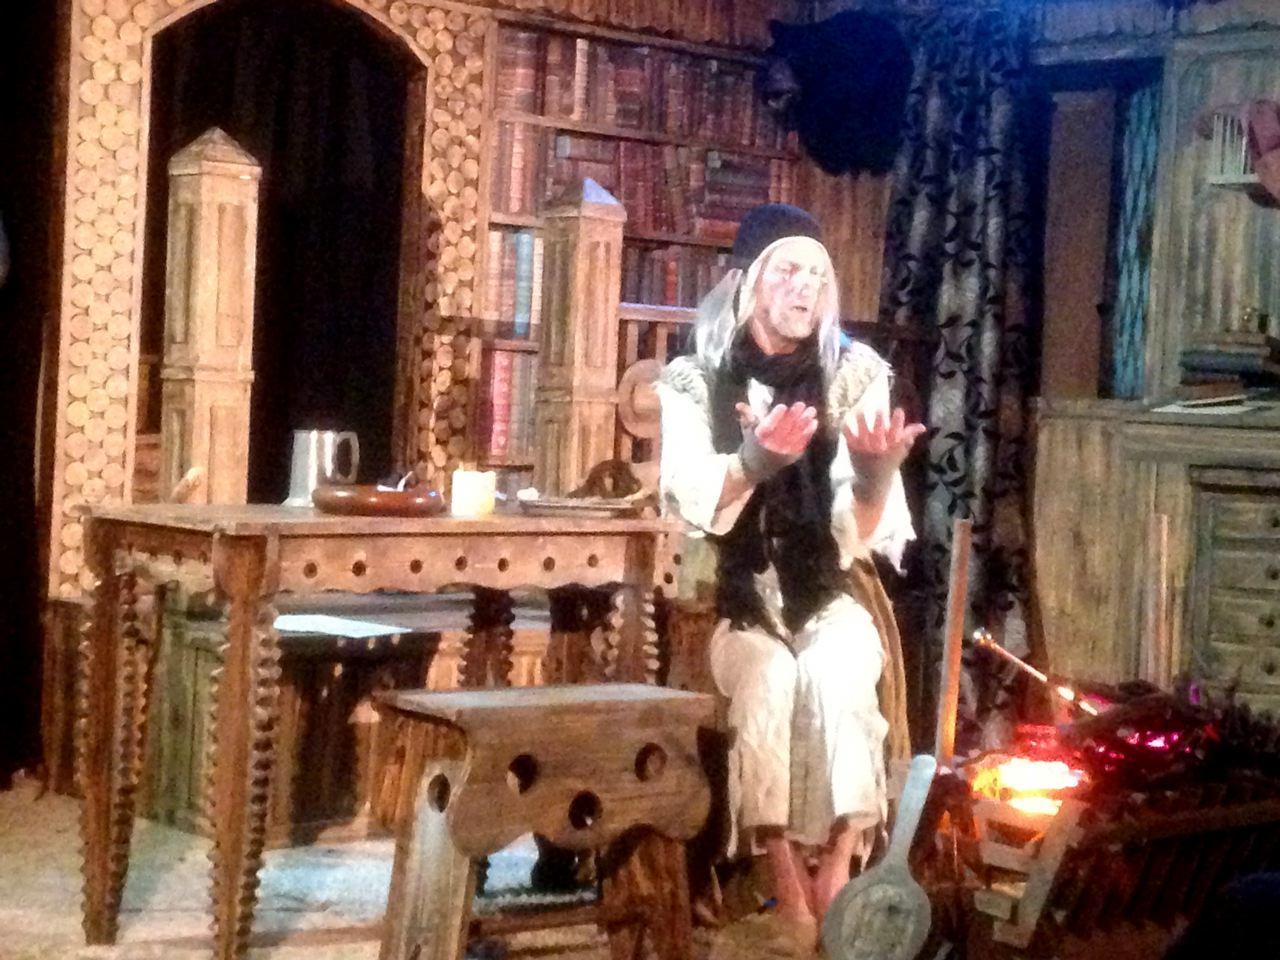 Neil King as John Aubrey in 'Brief Li ves'